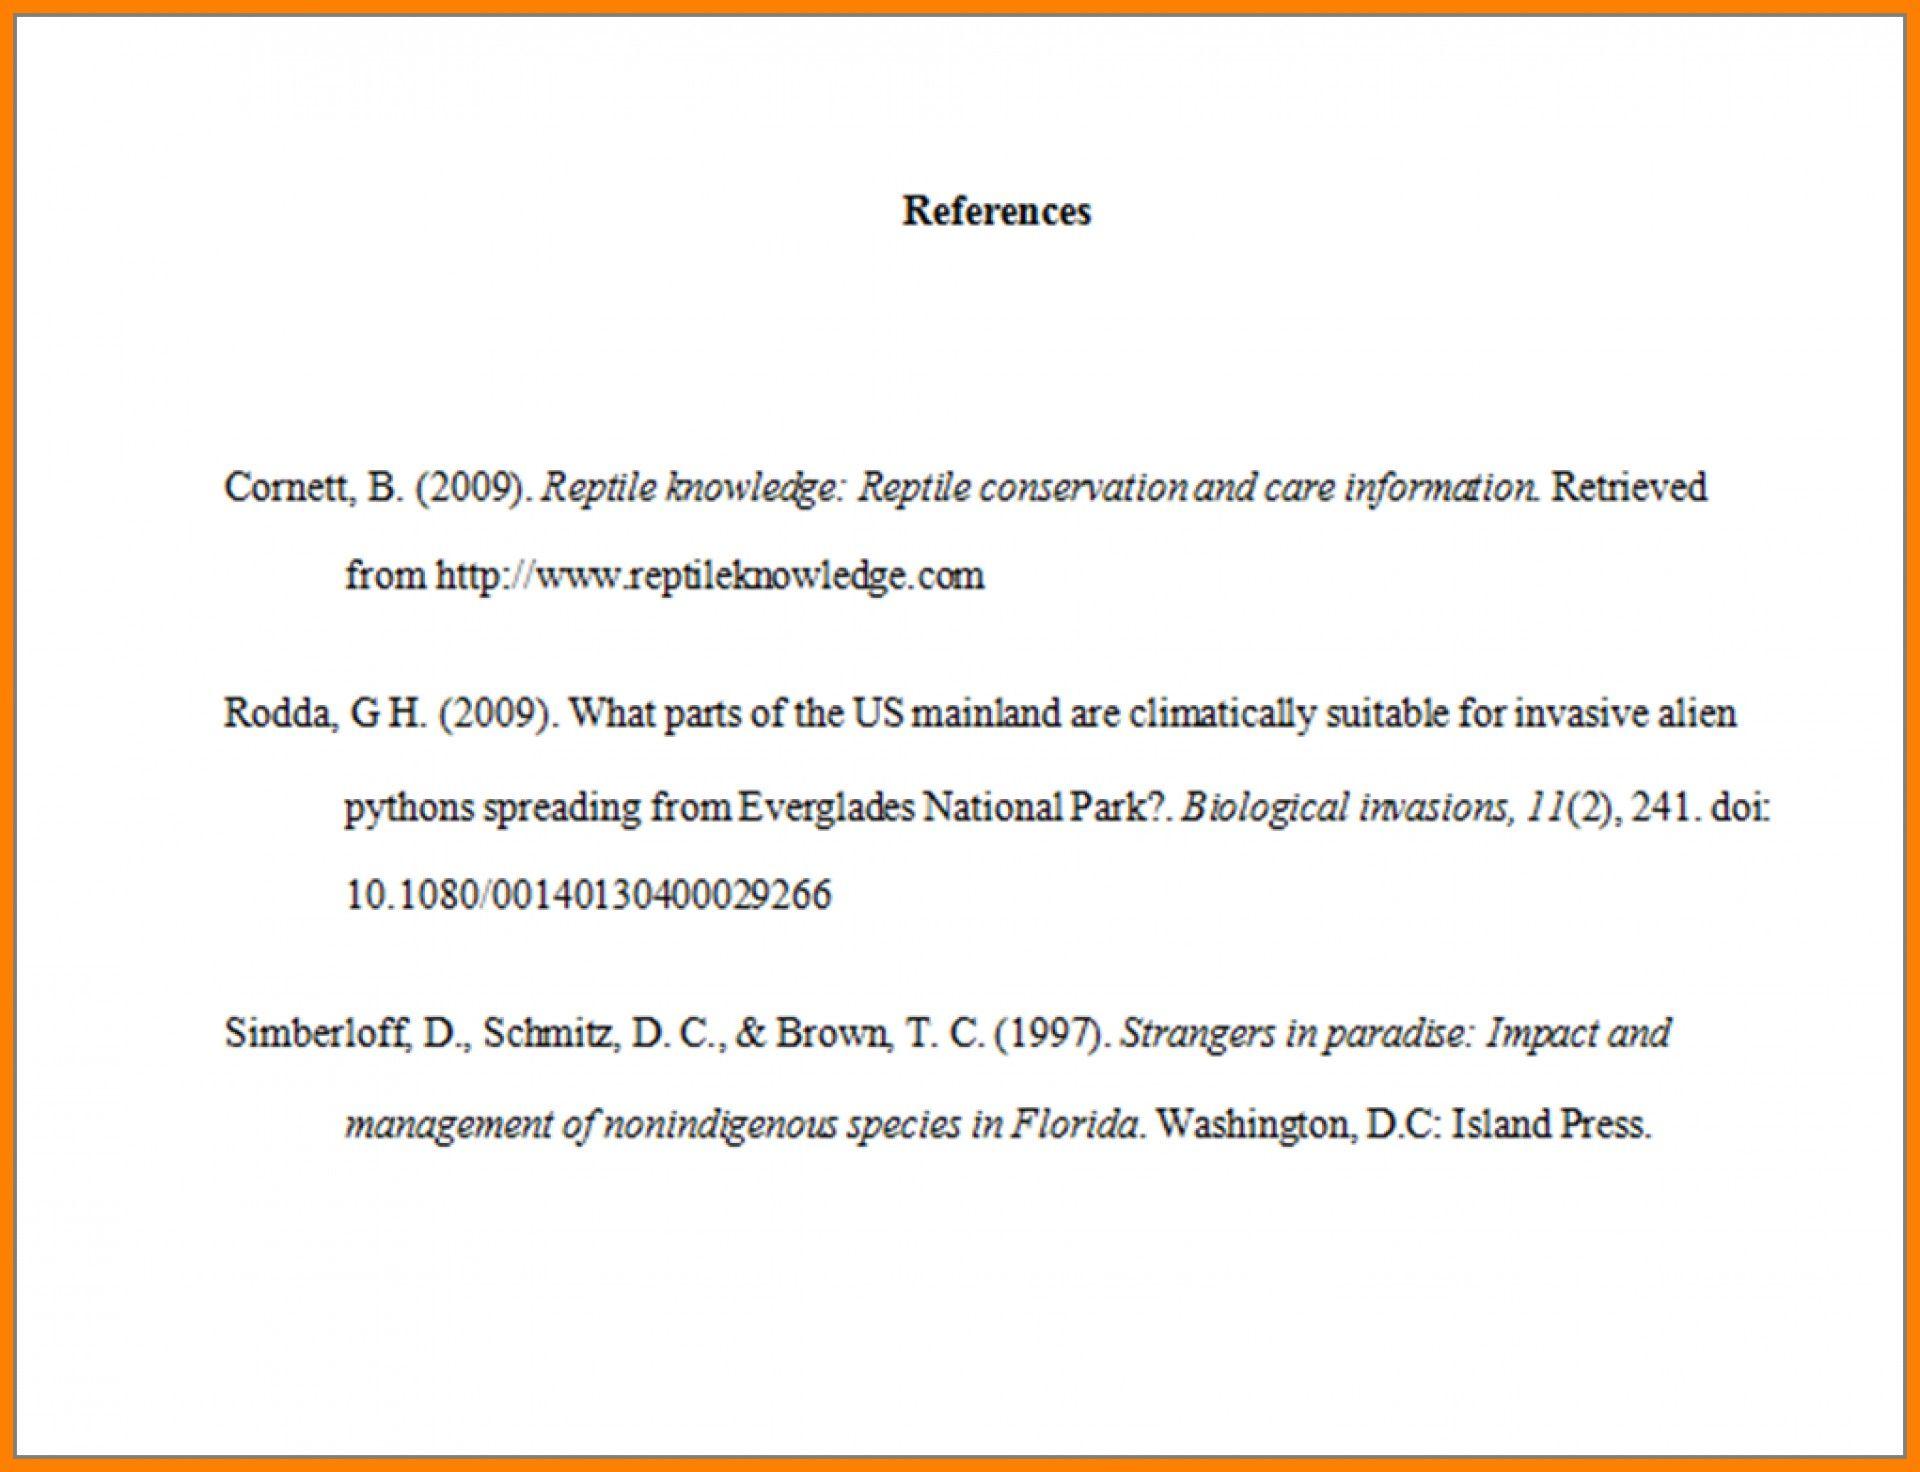 Download hindi essay on internet resume nfc 15100